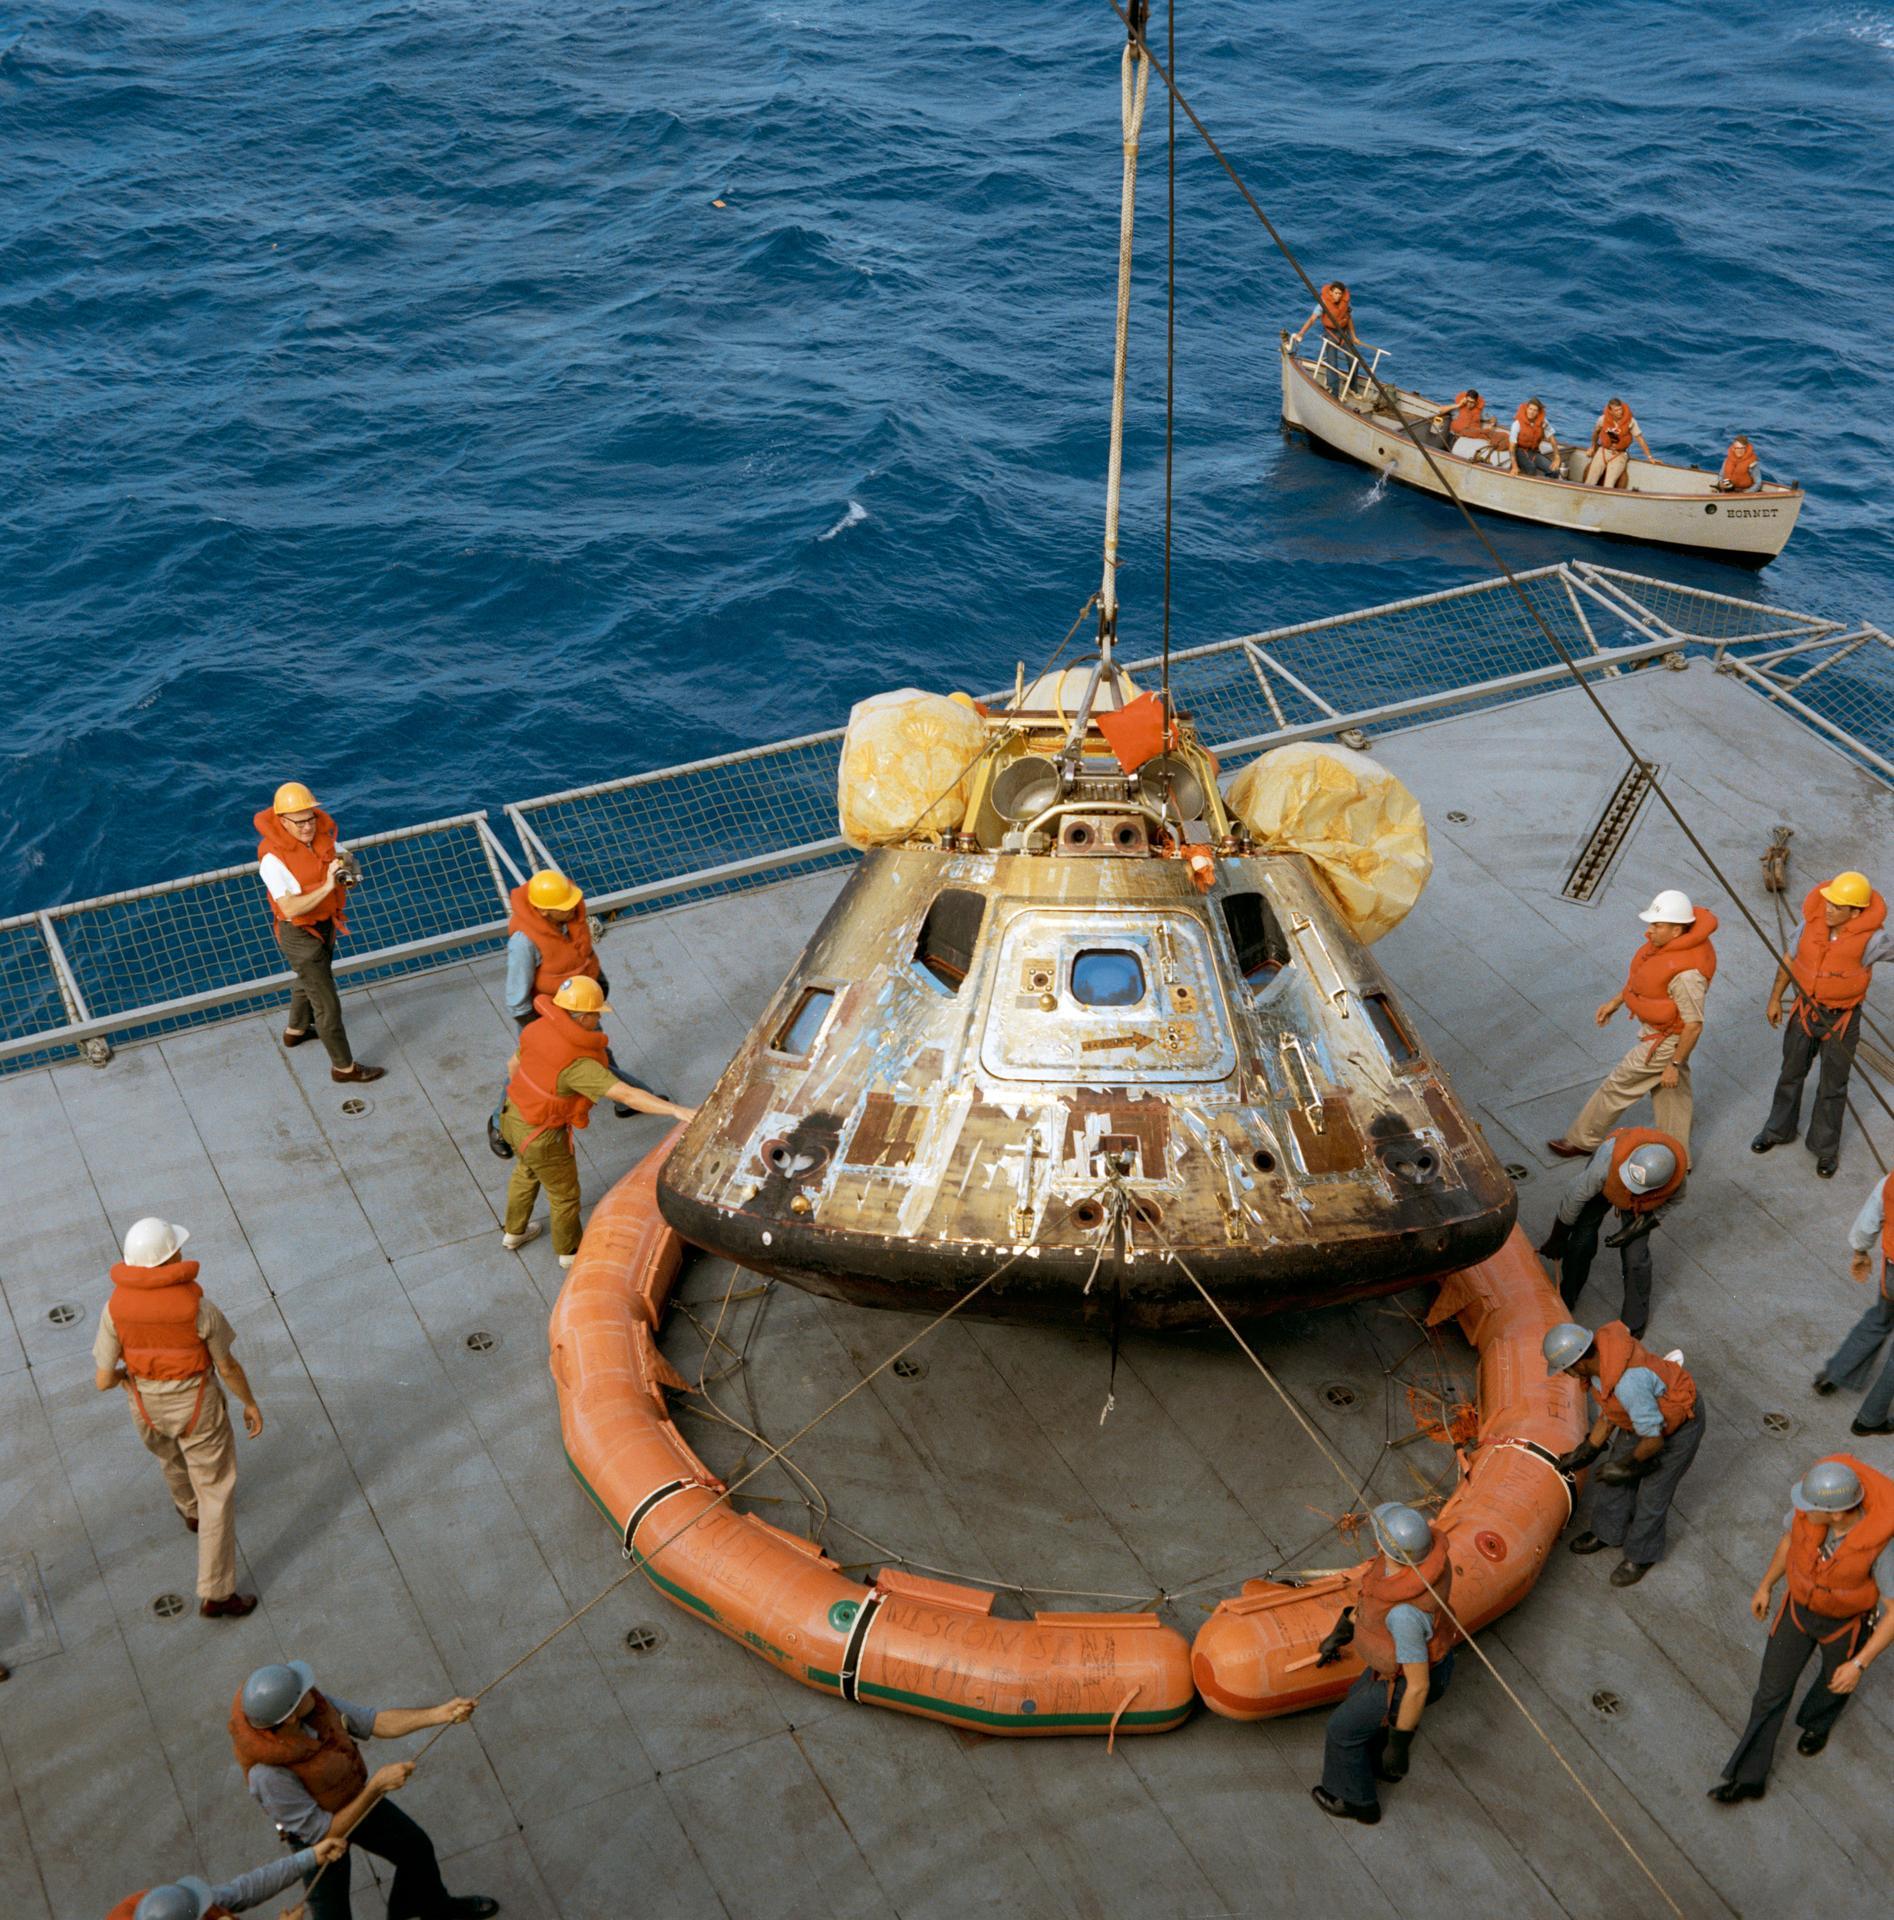 'Apollo's Moon Shot' Series Shows History of Human Lunar Exploration